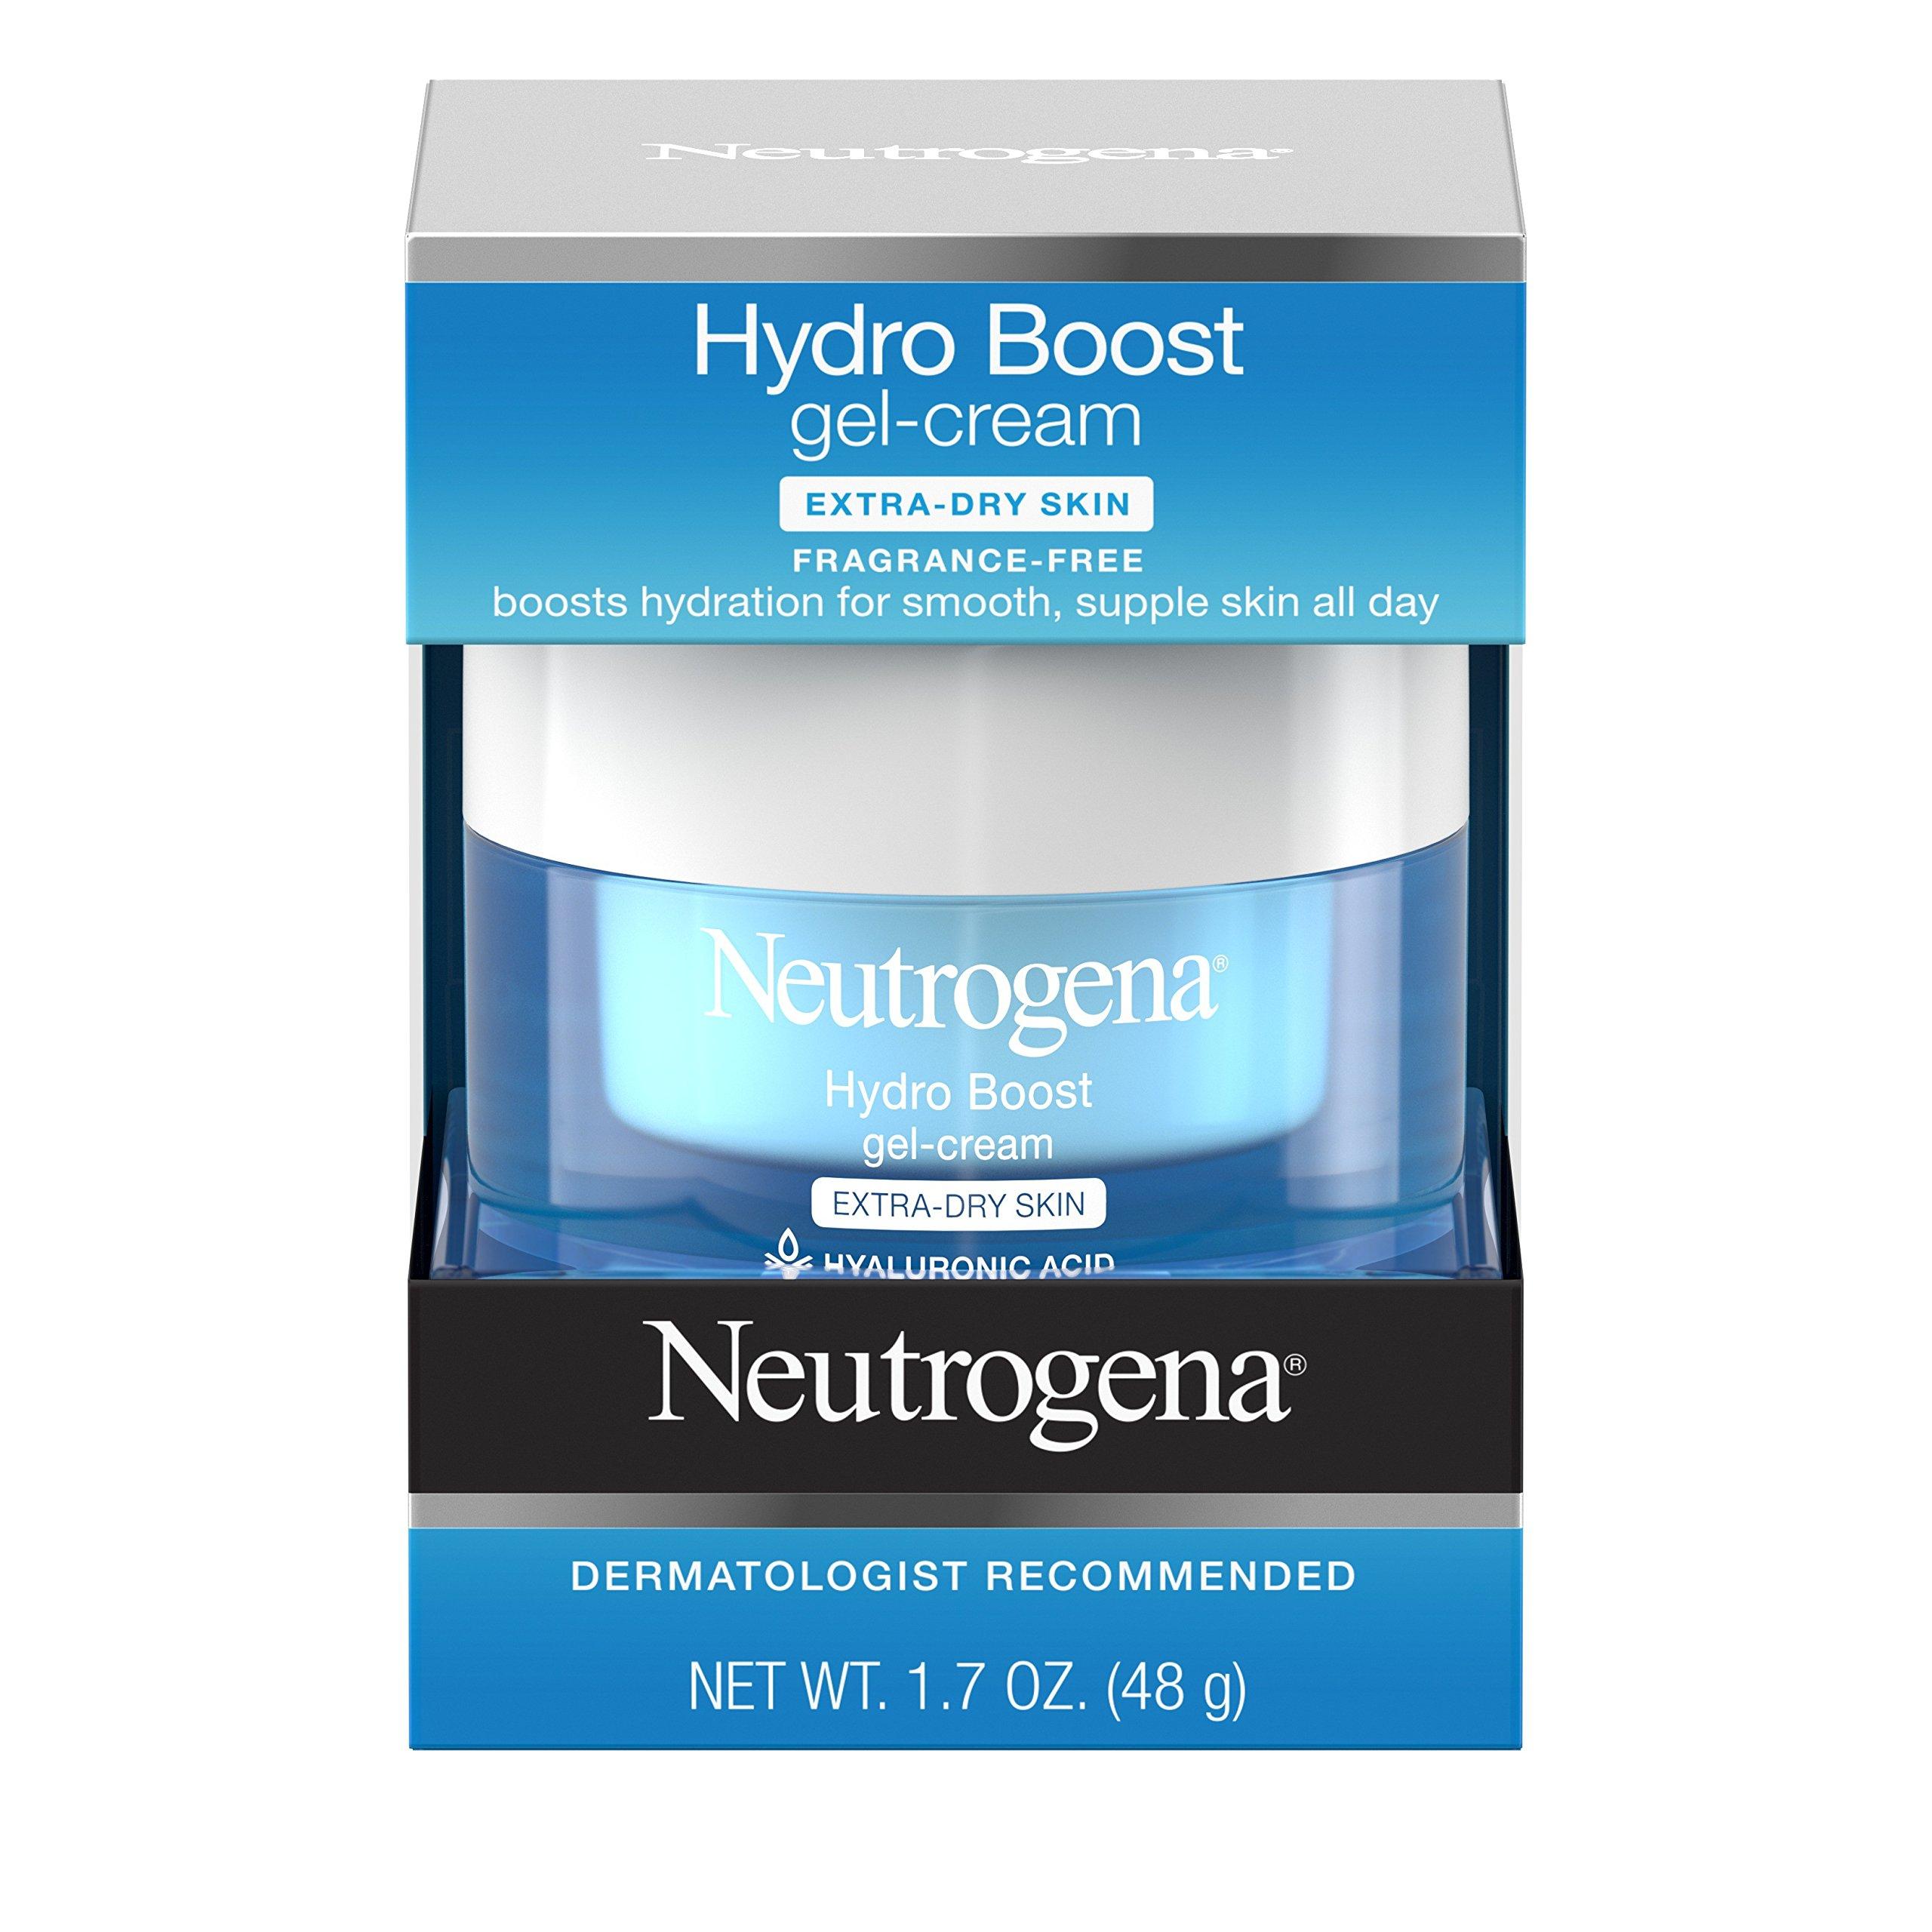 Neutrogena Hydro Boost Hyaluronic Acid Hydrating Face Moisturizer Gel-Cream to Hydrate and Smooth Extra-Dry Skin, 1.7 oz by Neutrogena (Image #4)